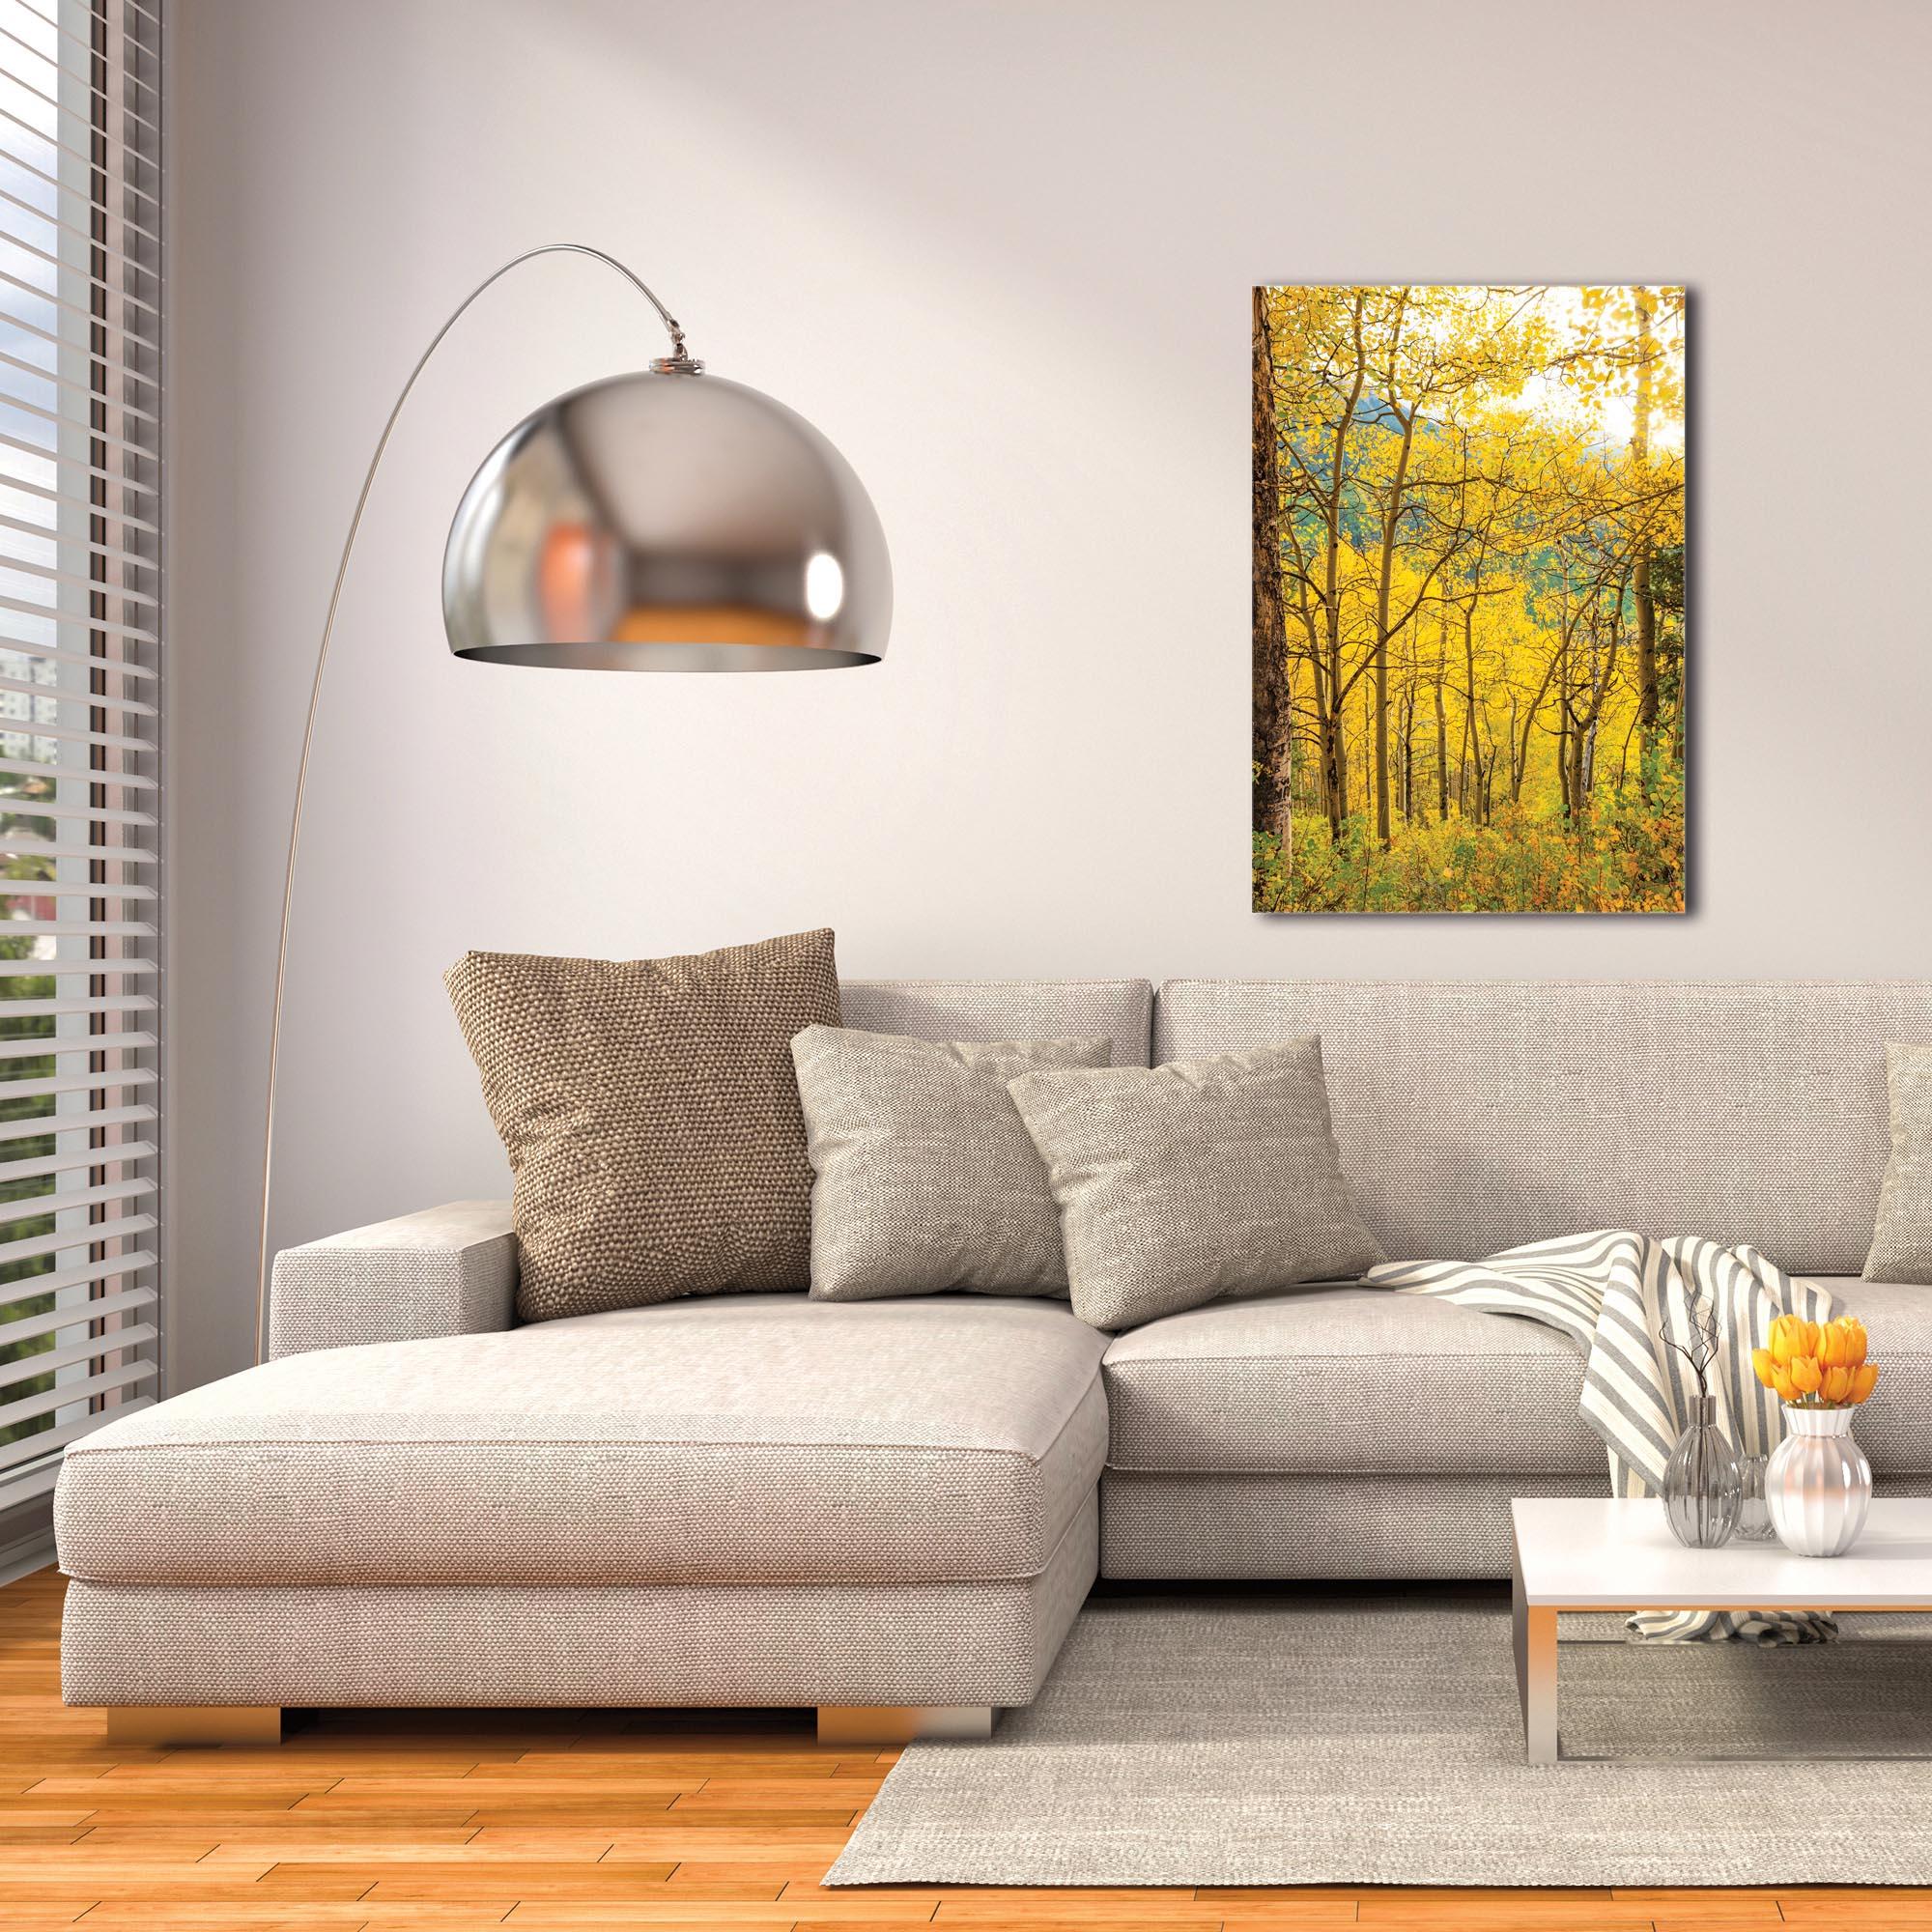 Landscape Photography 'Aspen Path' - Autumn Nature Art on Metal or Plexiglass - Image 3